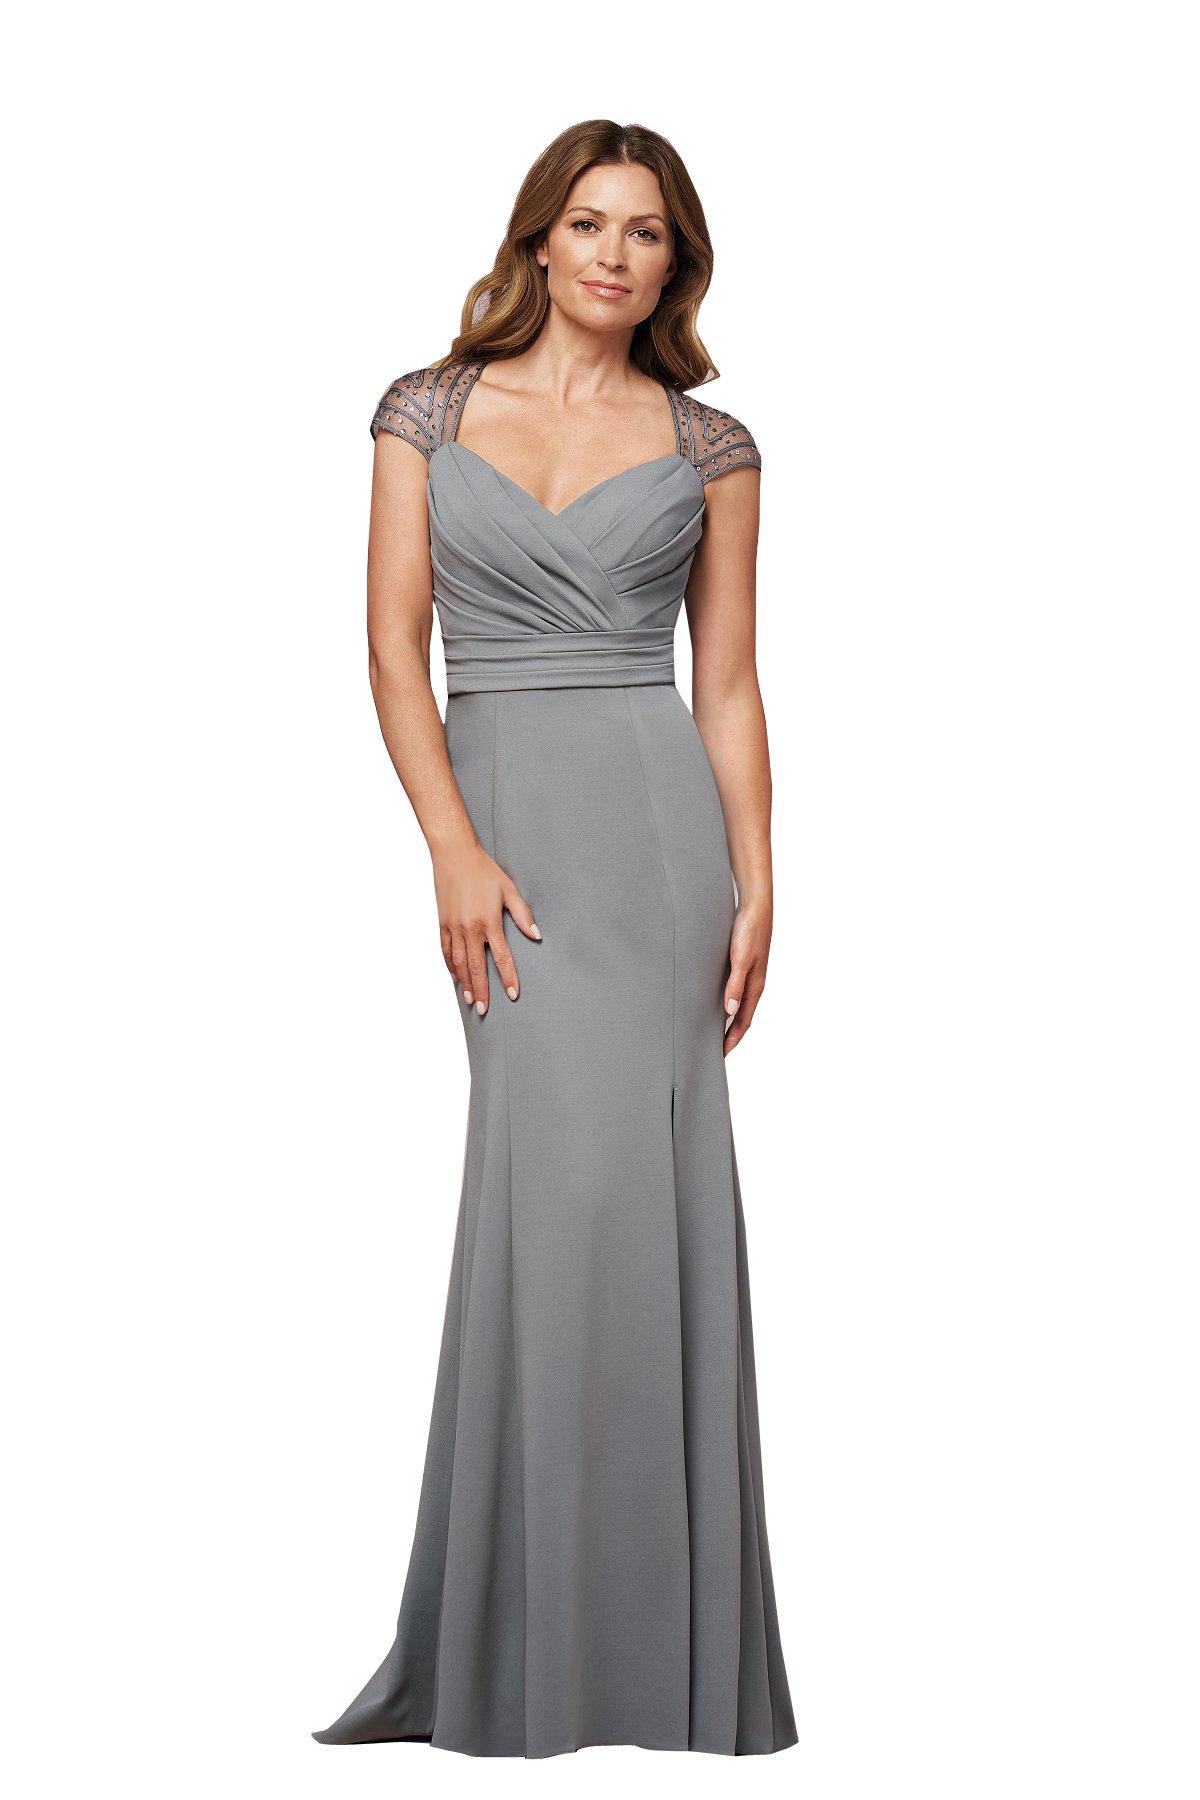 kelaixiang Mother of The Bride Dress Satin Sweet Heart Cap Sleeves Empire Line Evening Dress